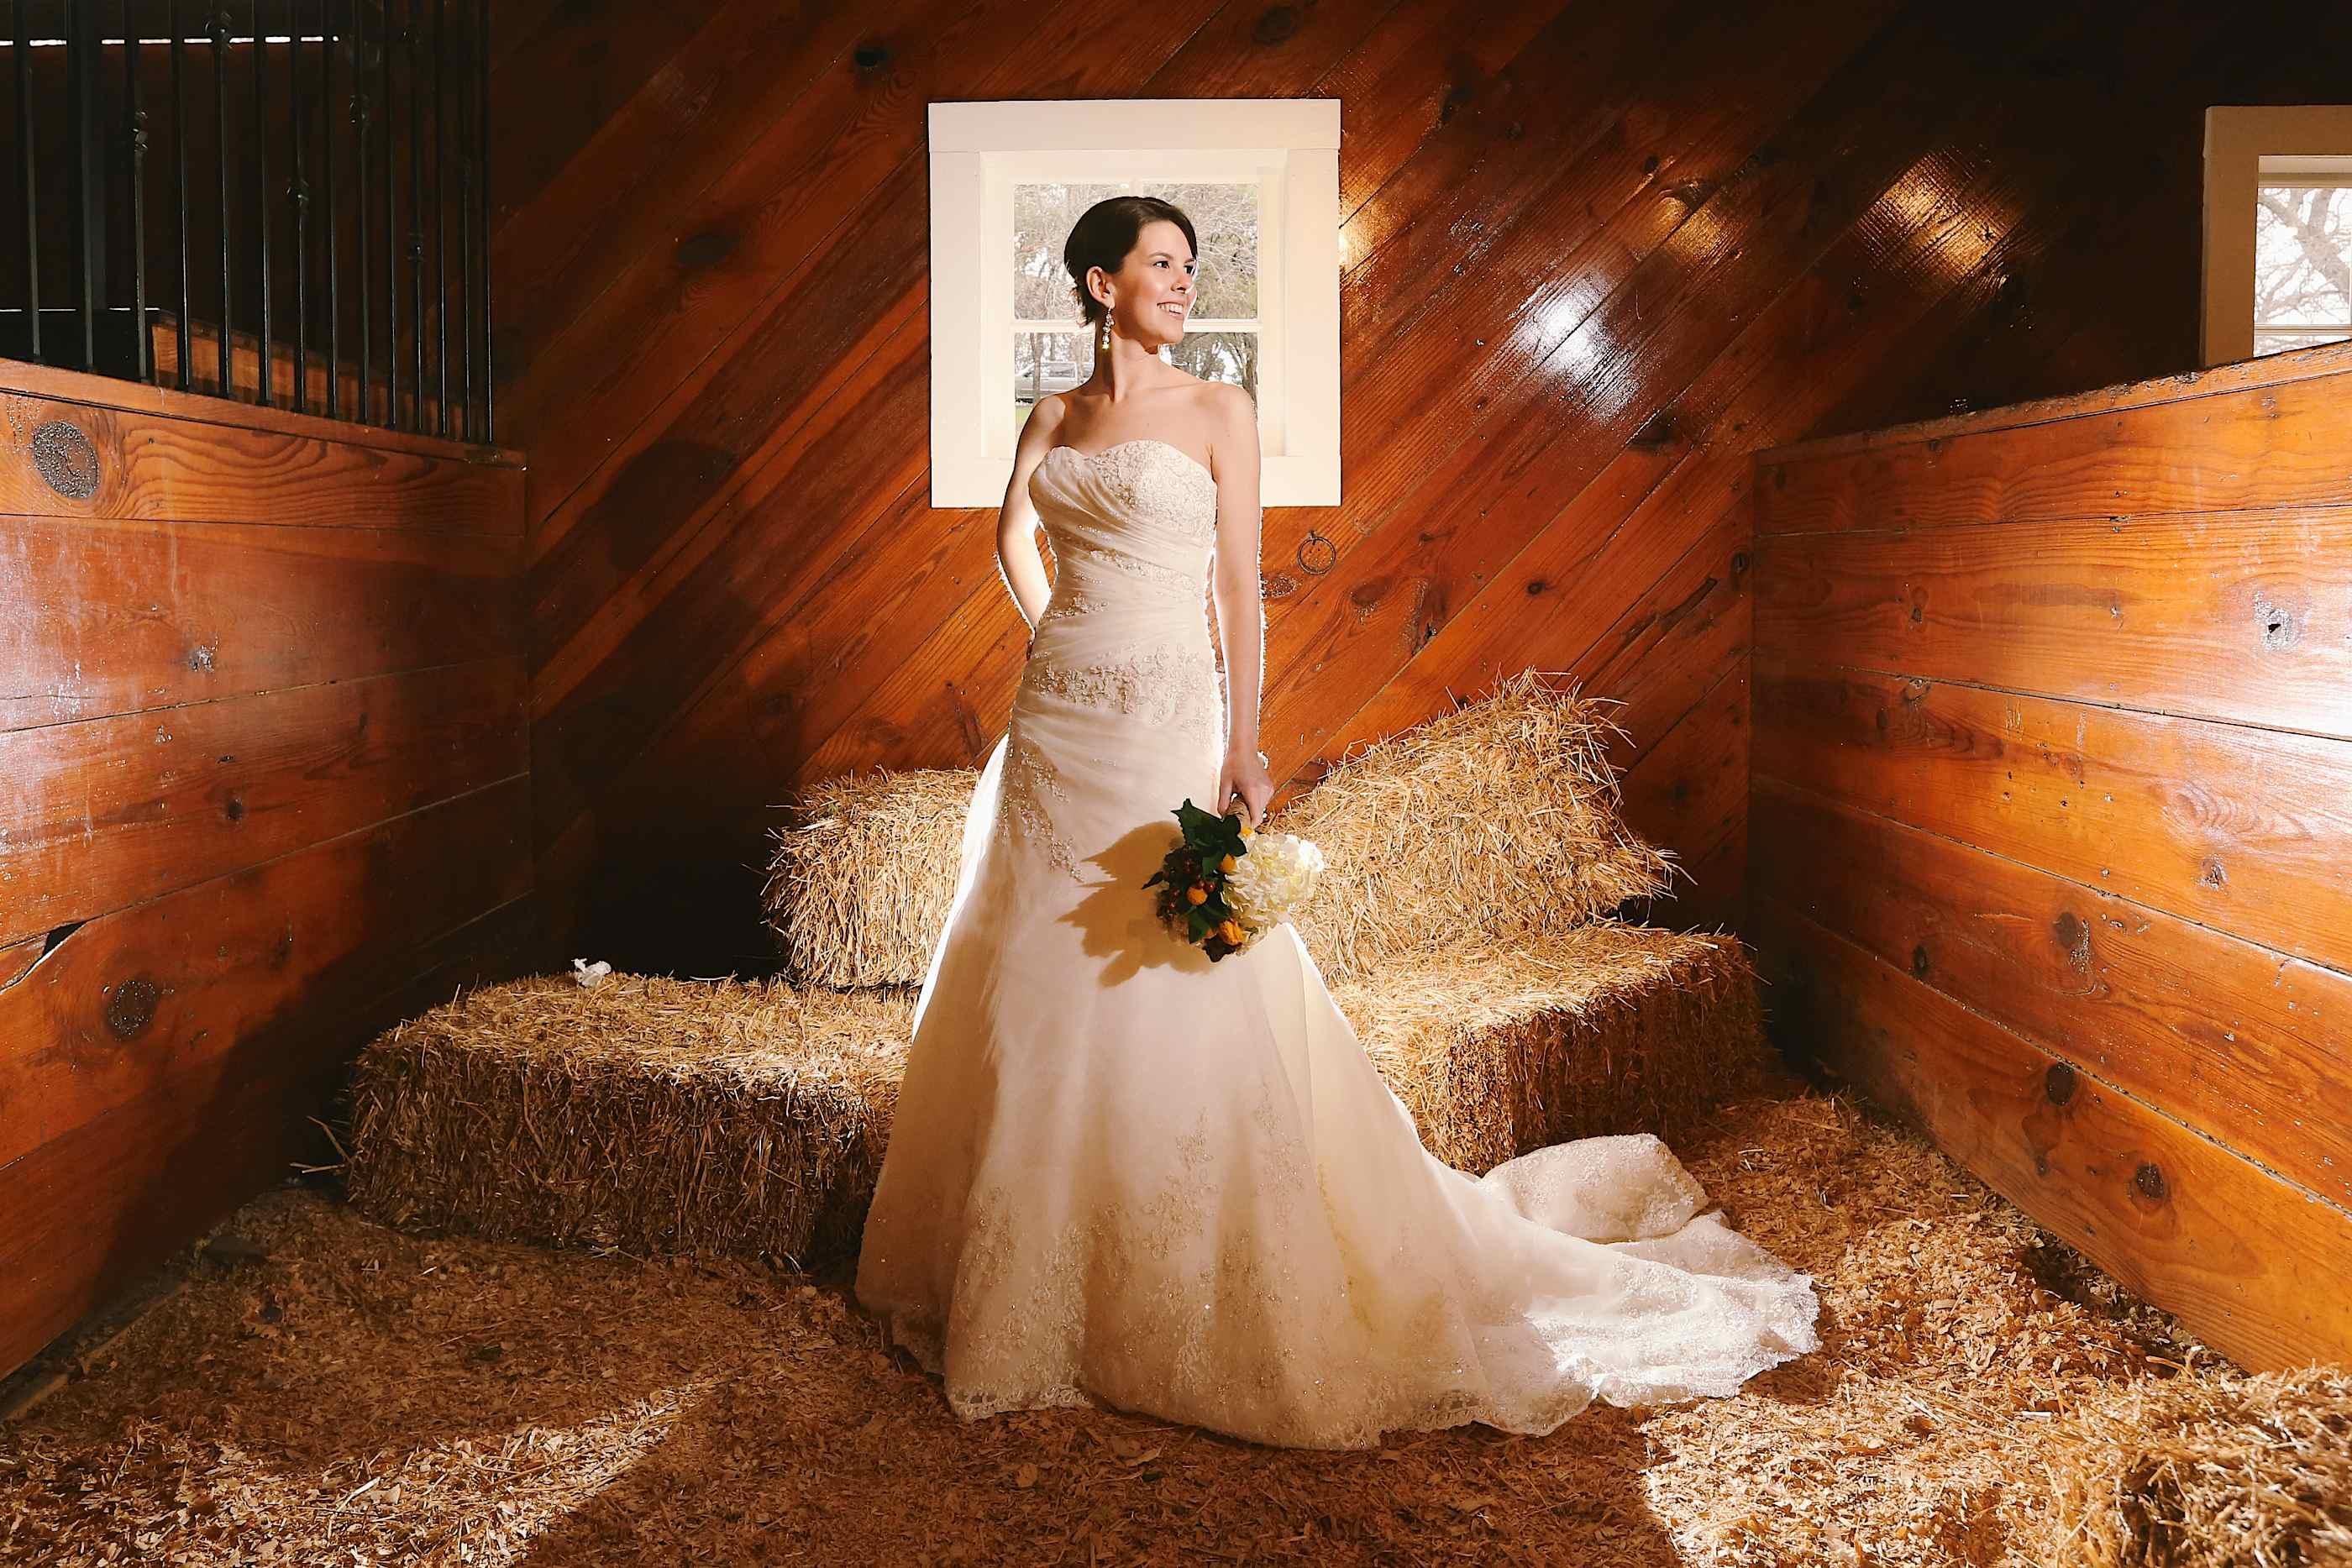 top-10-bride-photos-2013-001